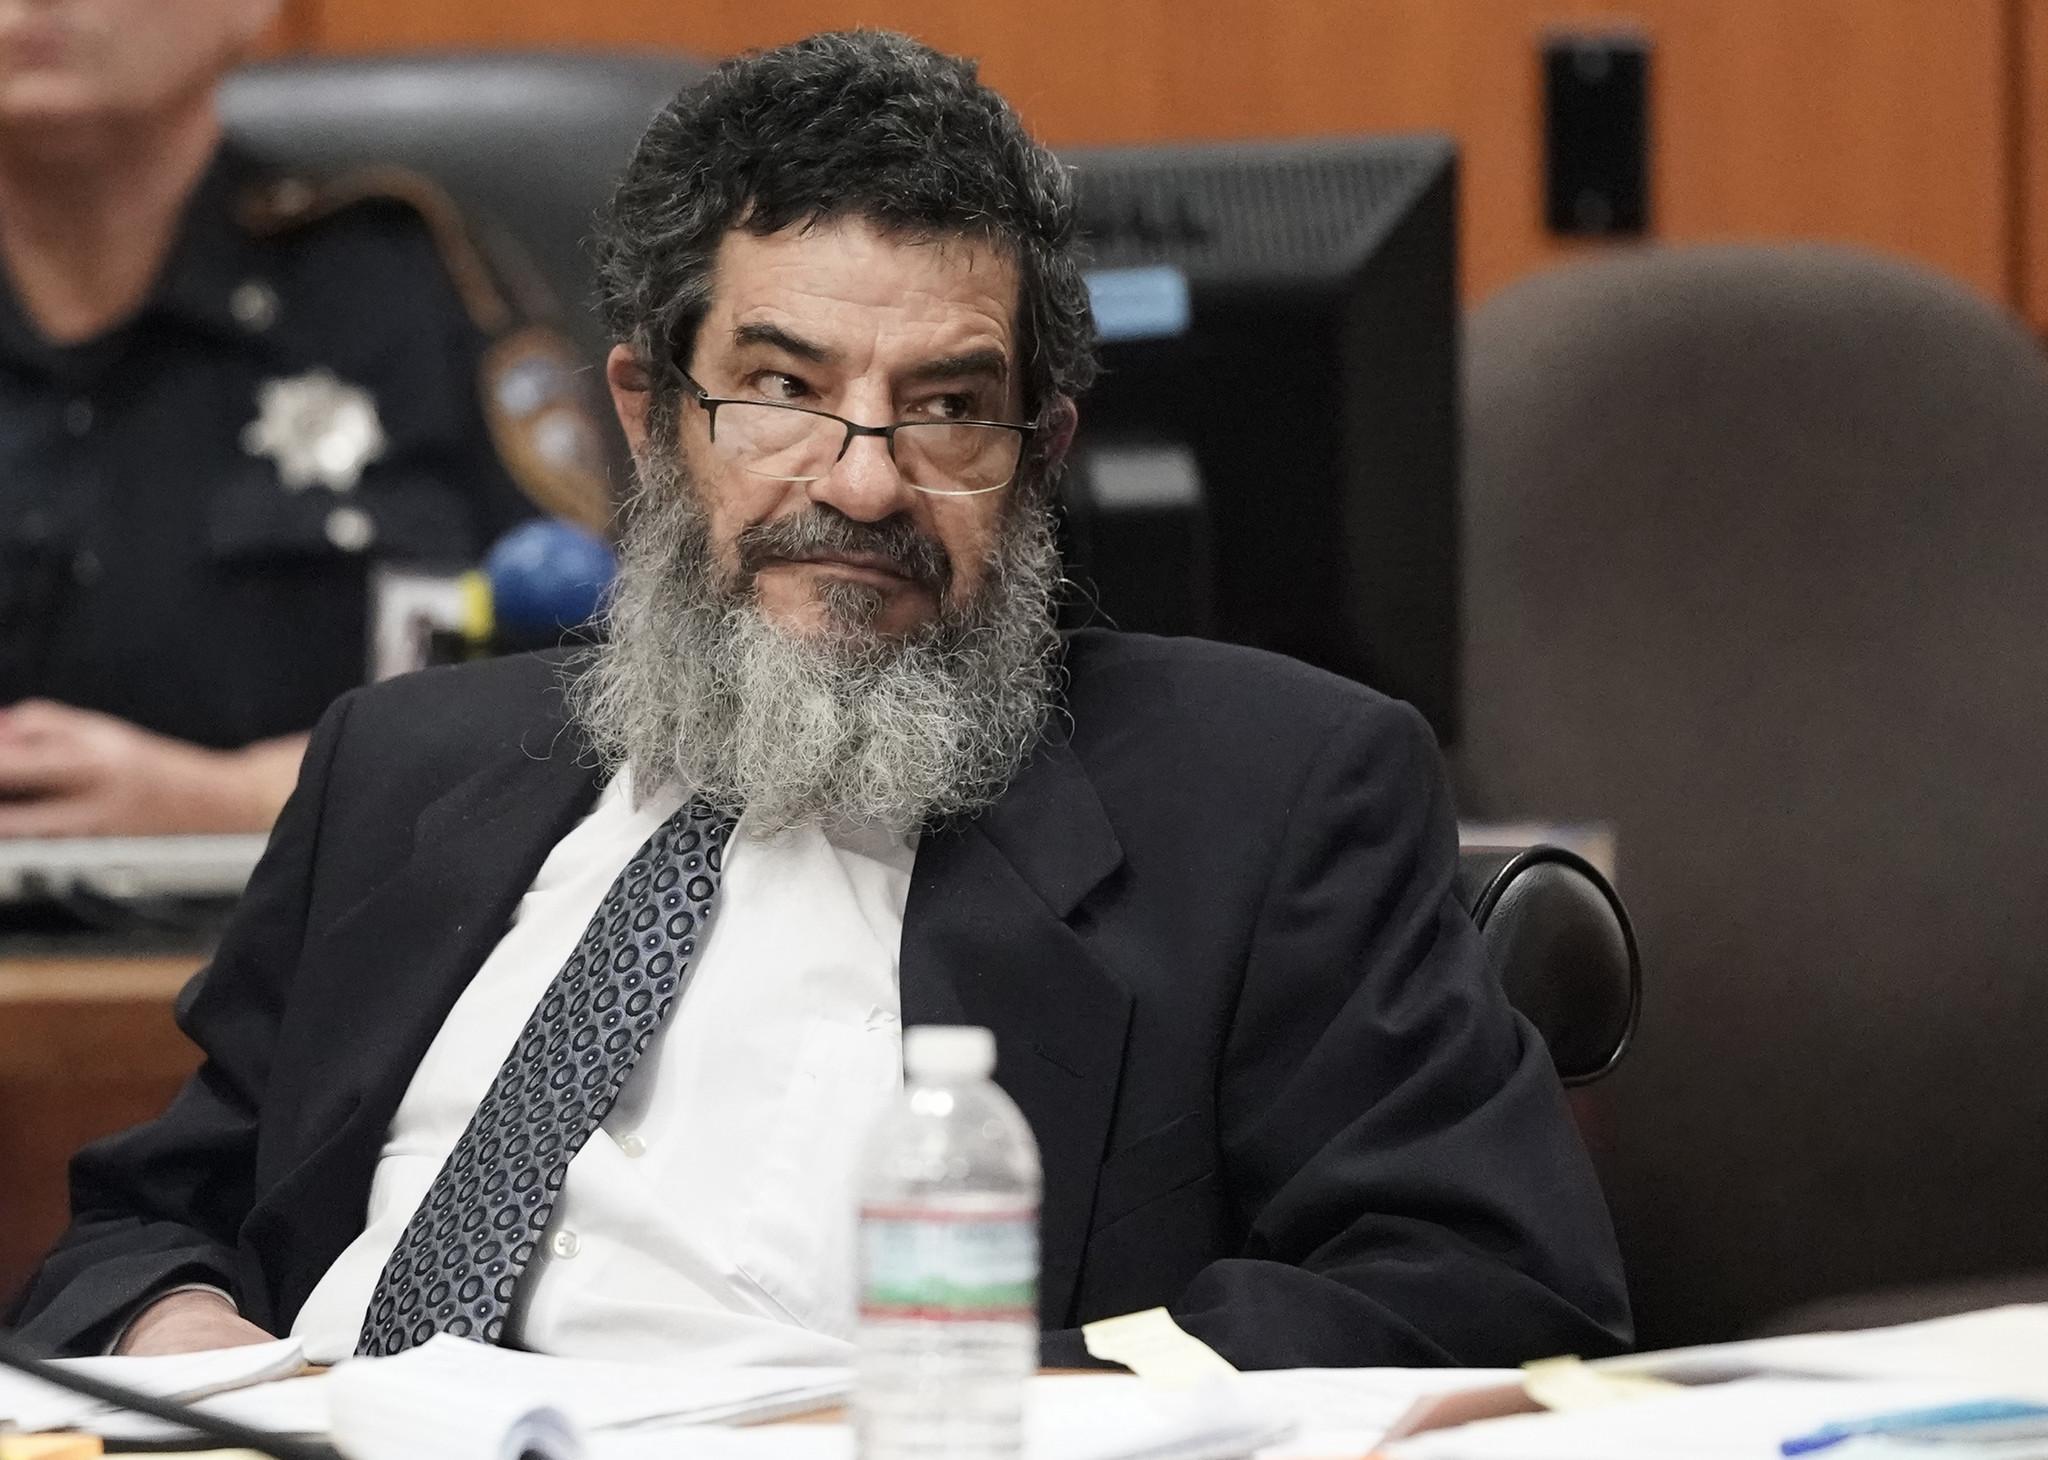 Jordanian immigrant gets death for Houston 'honor killings'